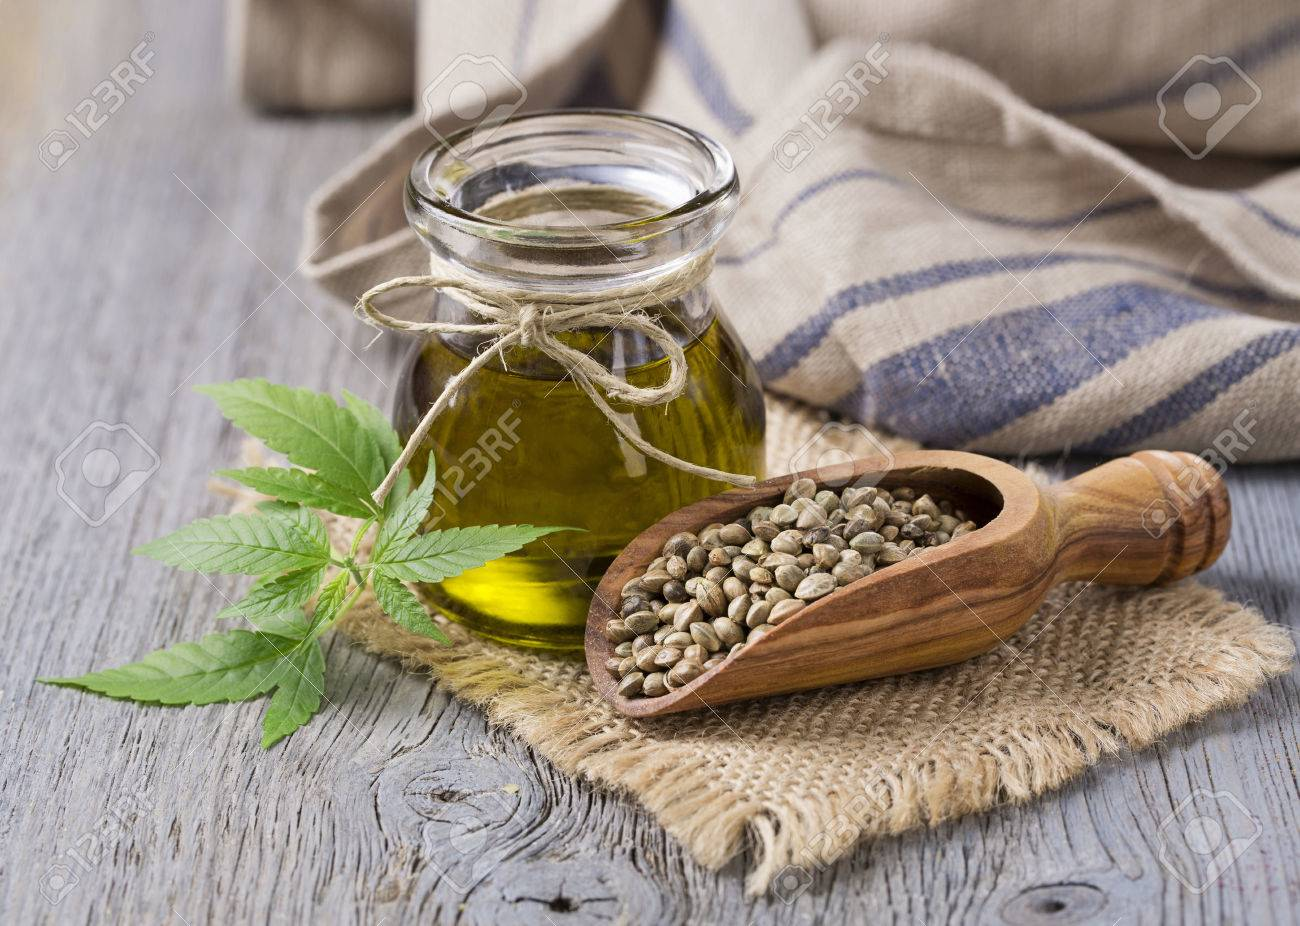 Hemp oil n a glass jar and hemp seeds - 55678040